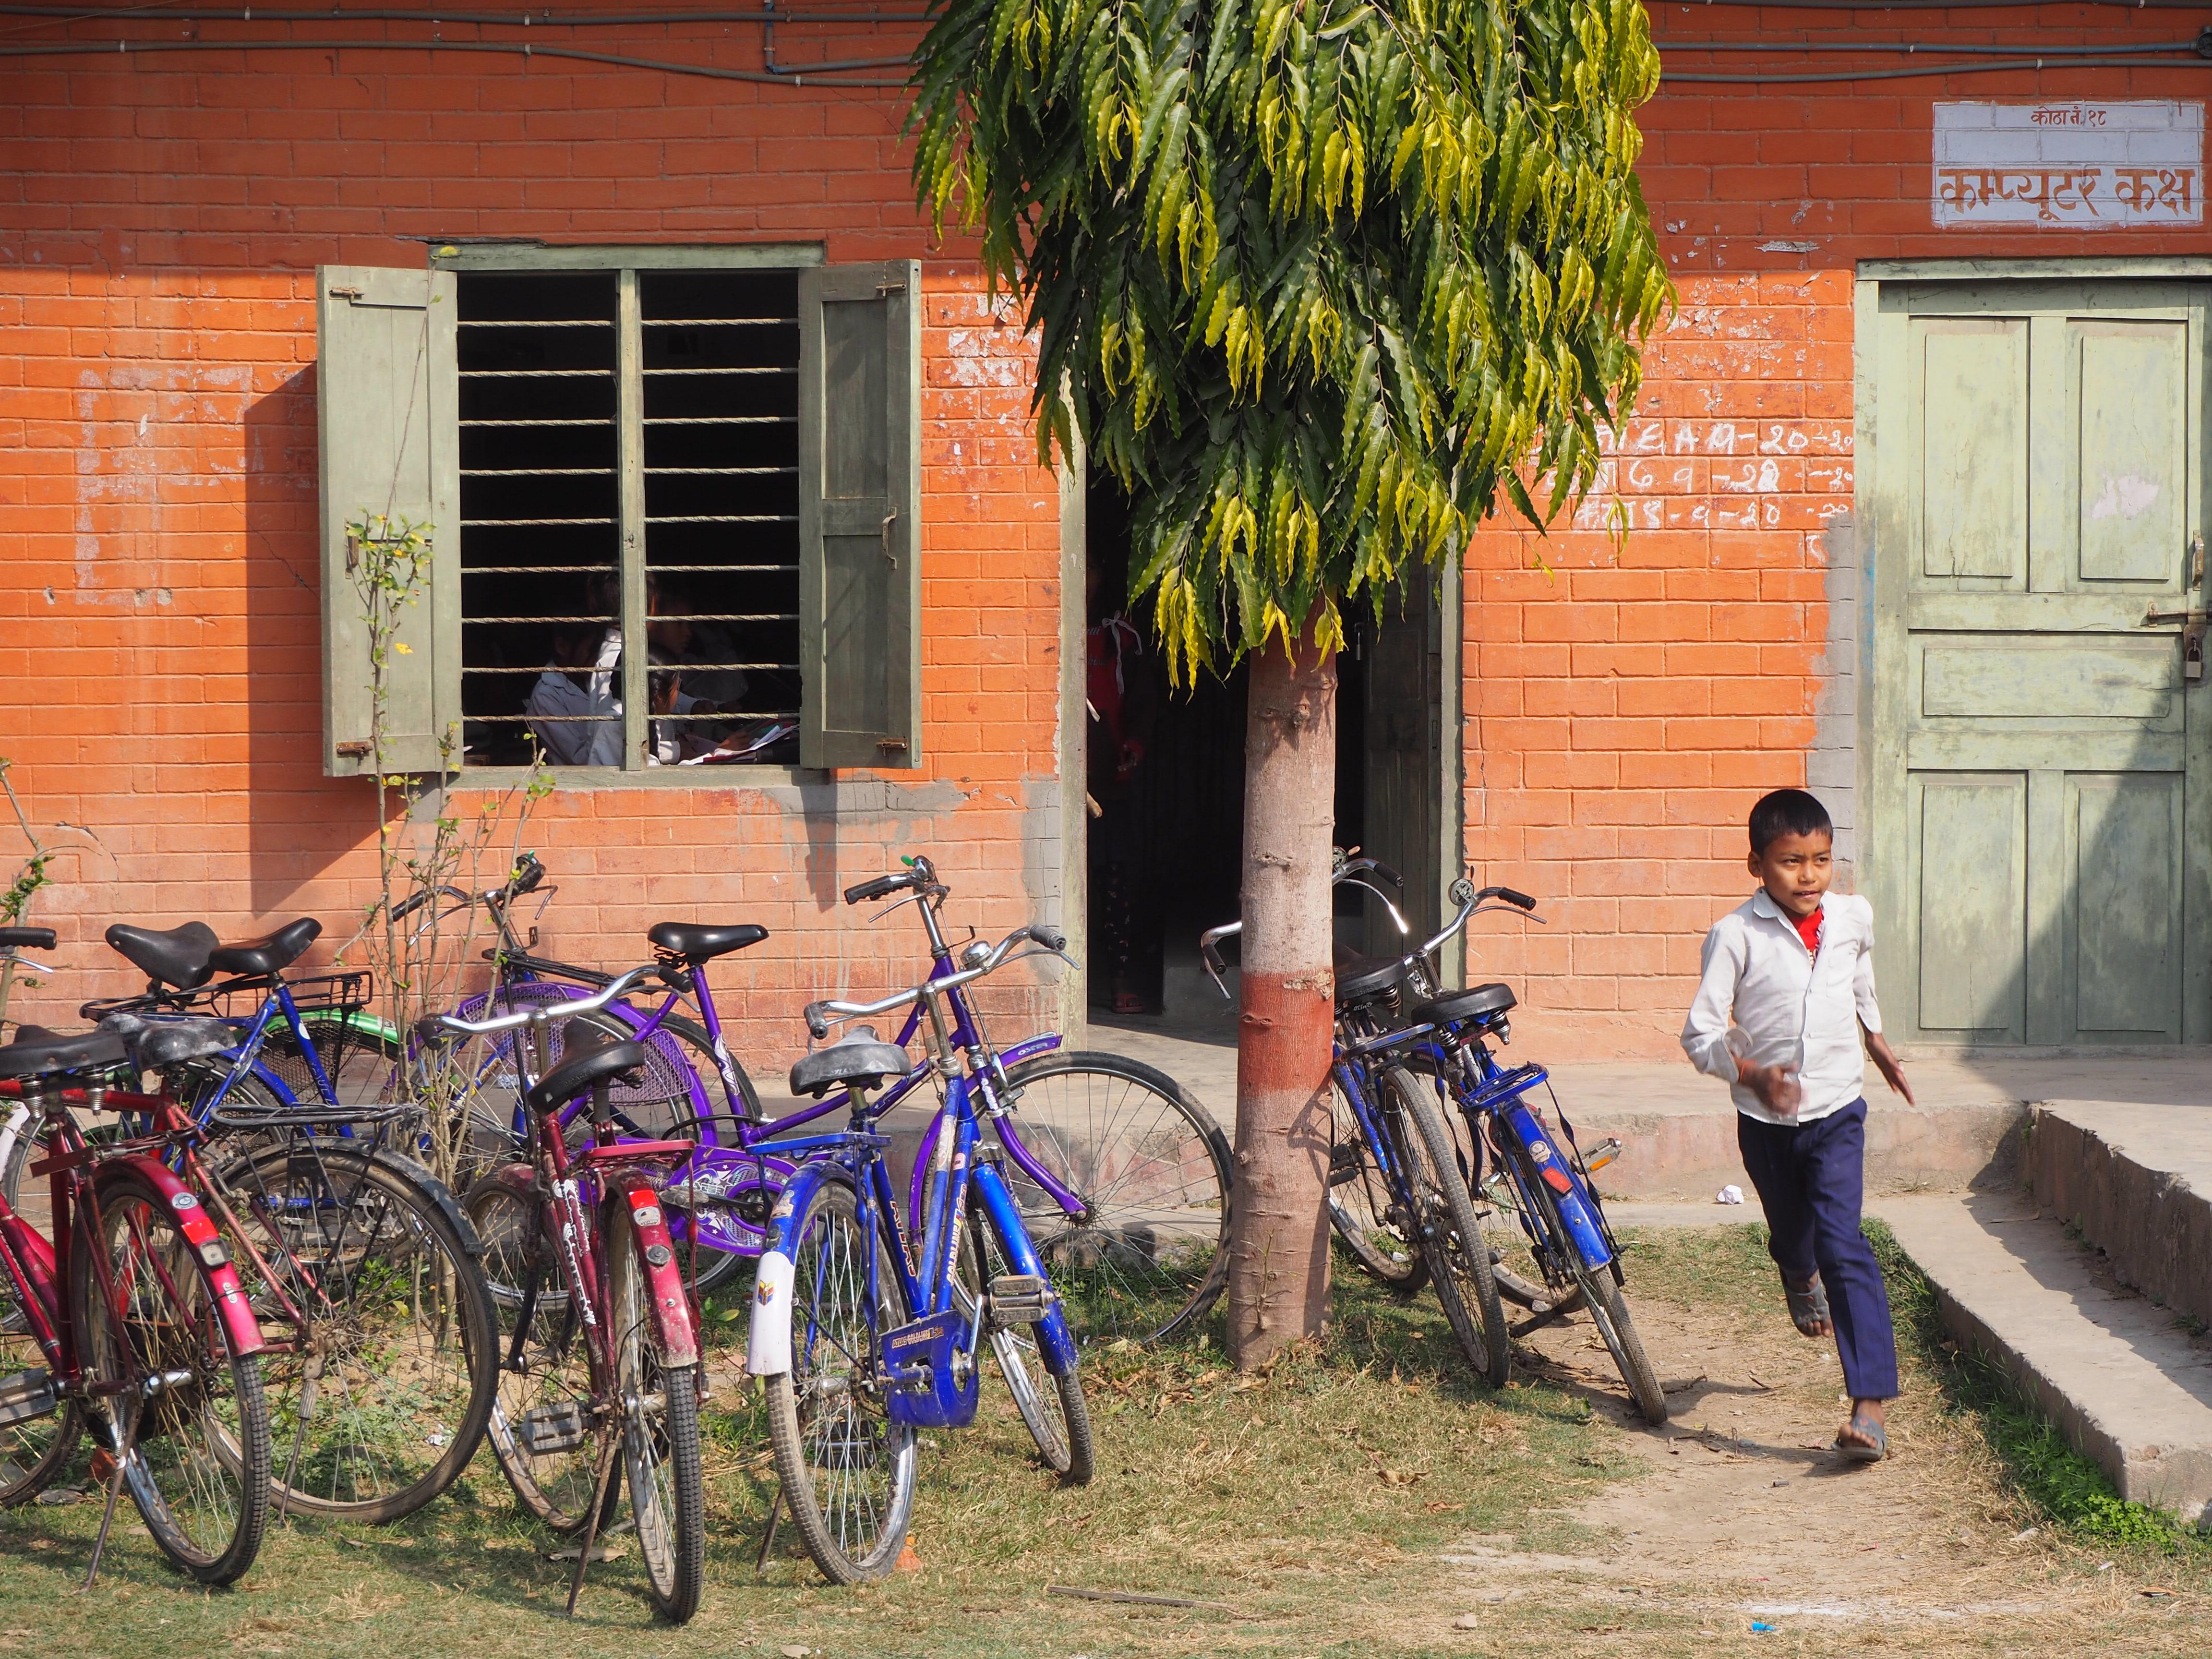 Amar Shahid Shri Dasrath Chand School, where Pramila Tharu studied. Credit: Peter Gill